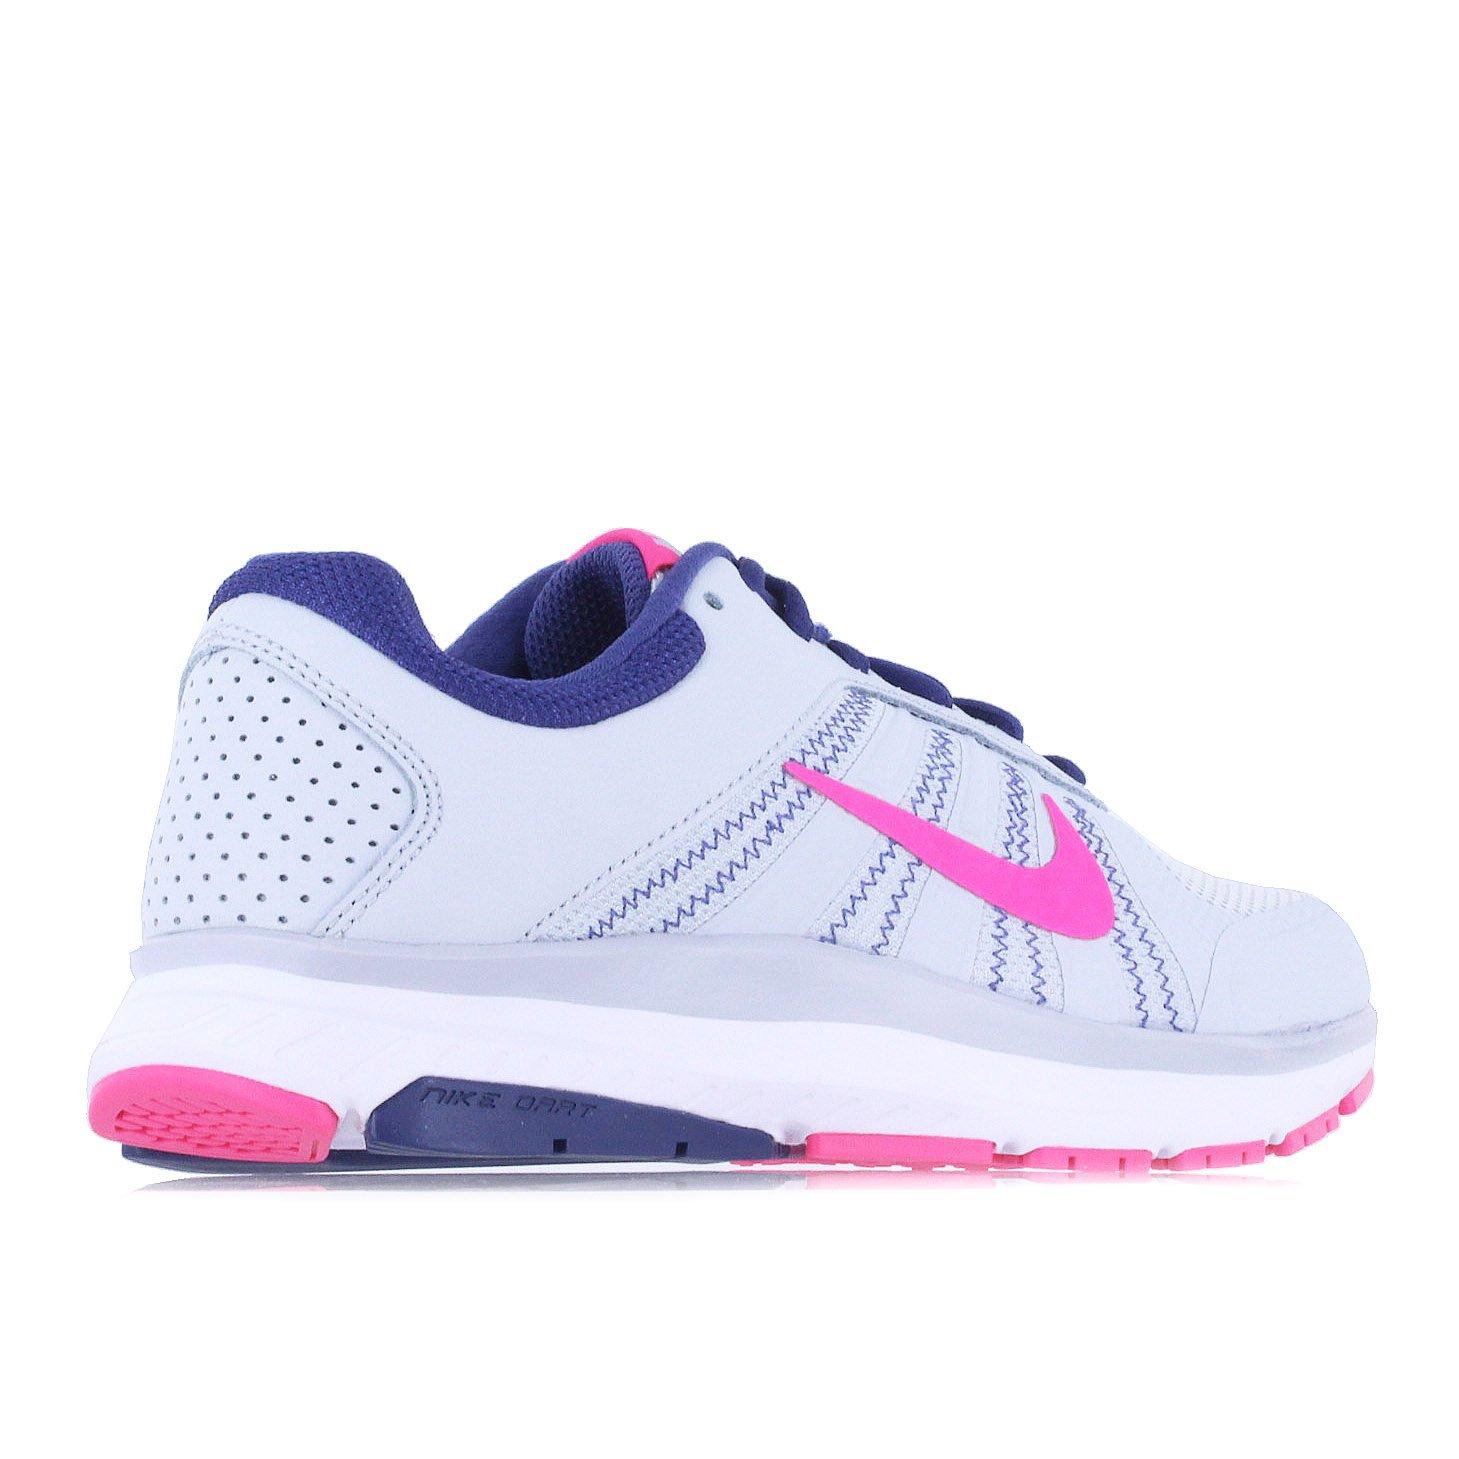 buy popular 3f655 4e9d1 Galleon - Nike Women s Dart 12 Pr Pltnm Pnk Blst Dk Prpl Dst Running Shoe 6  Women US